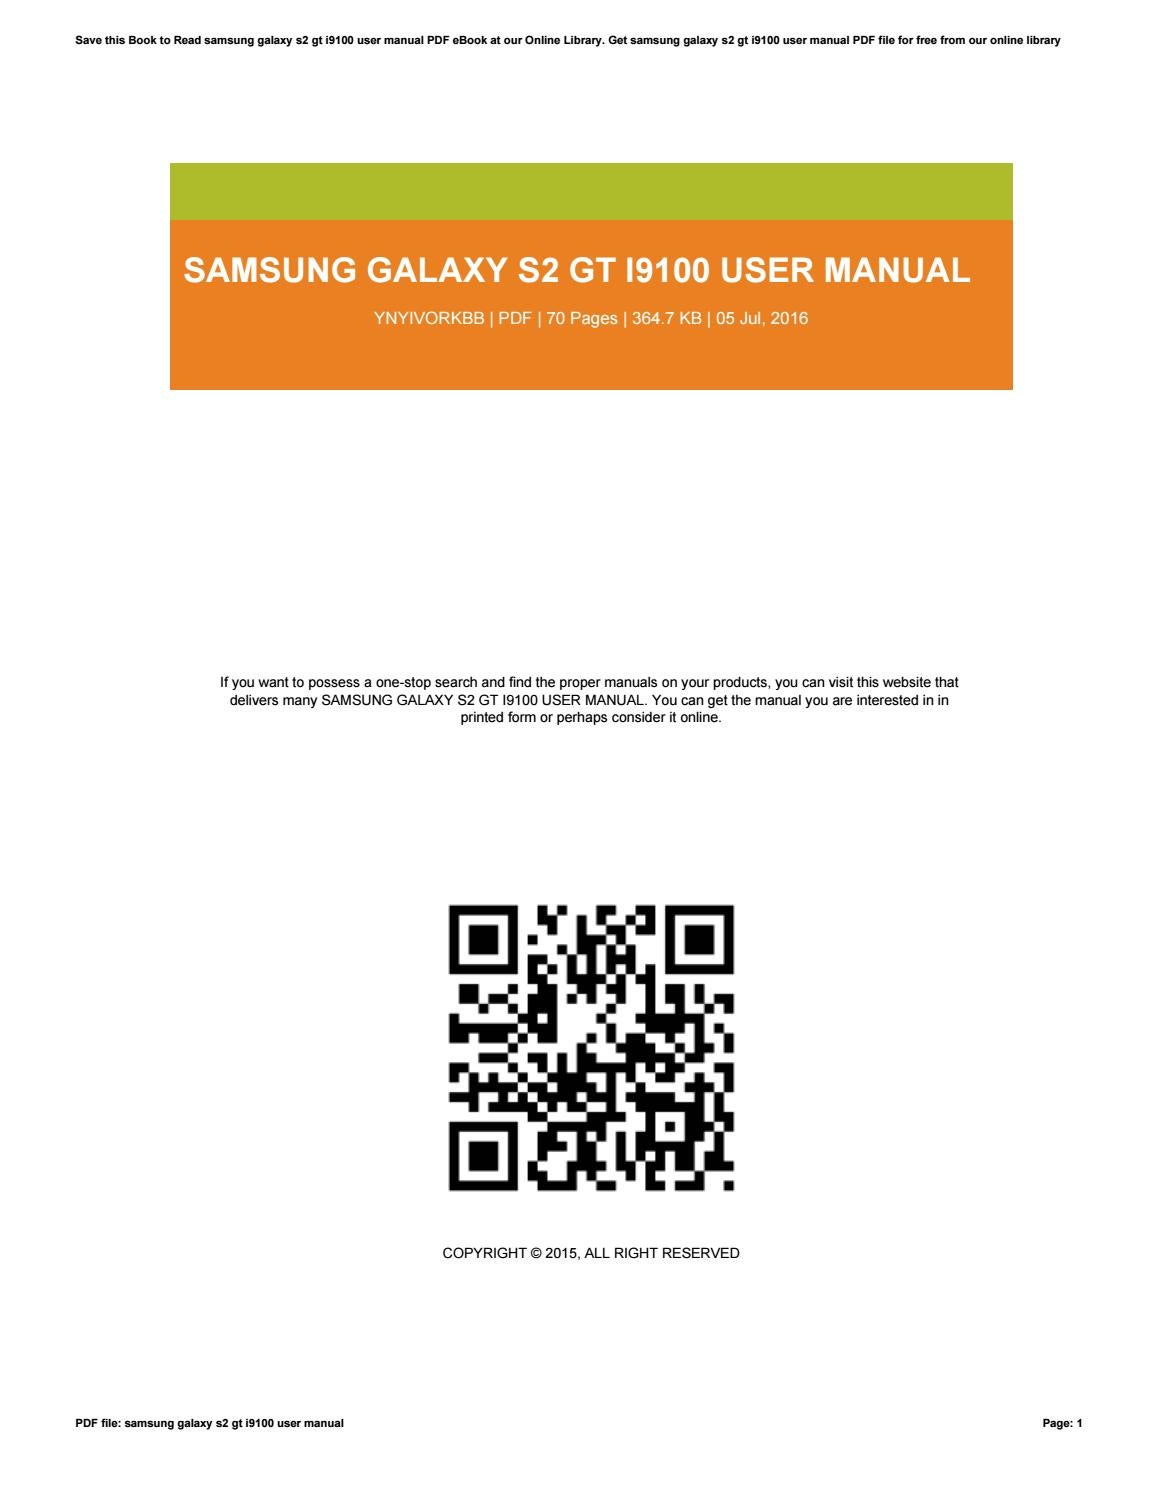 Samsung galaxy-s2-gt-i9100-user-manual.